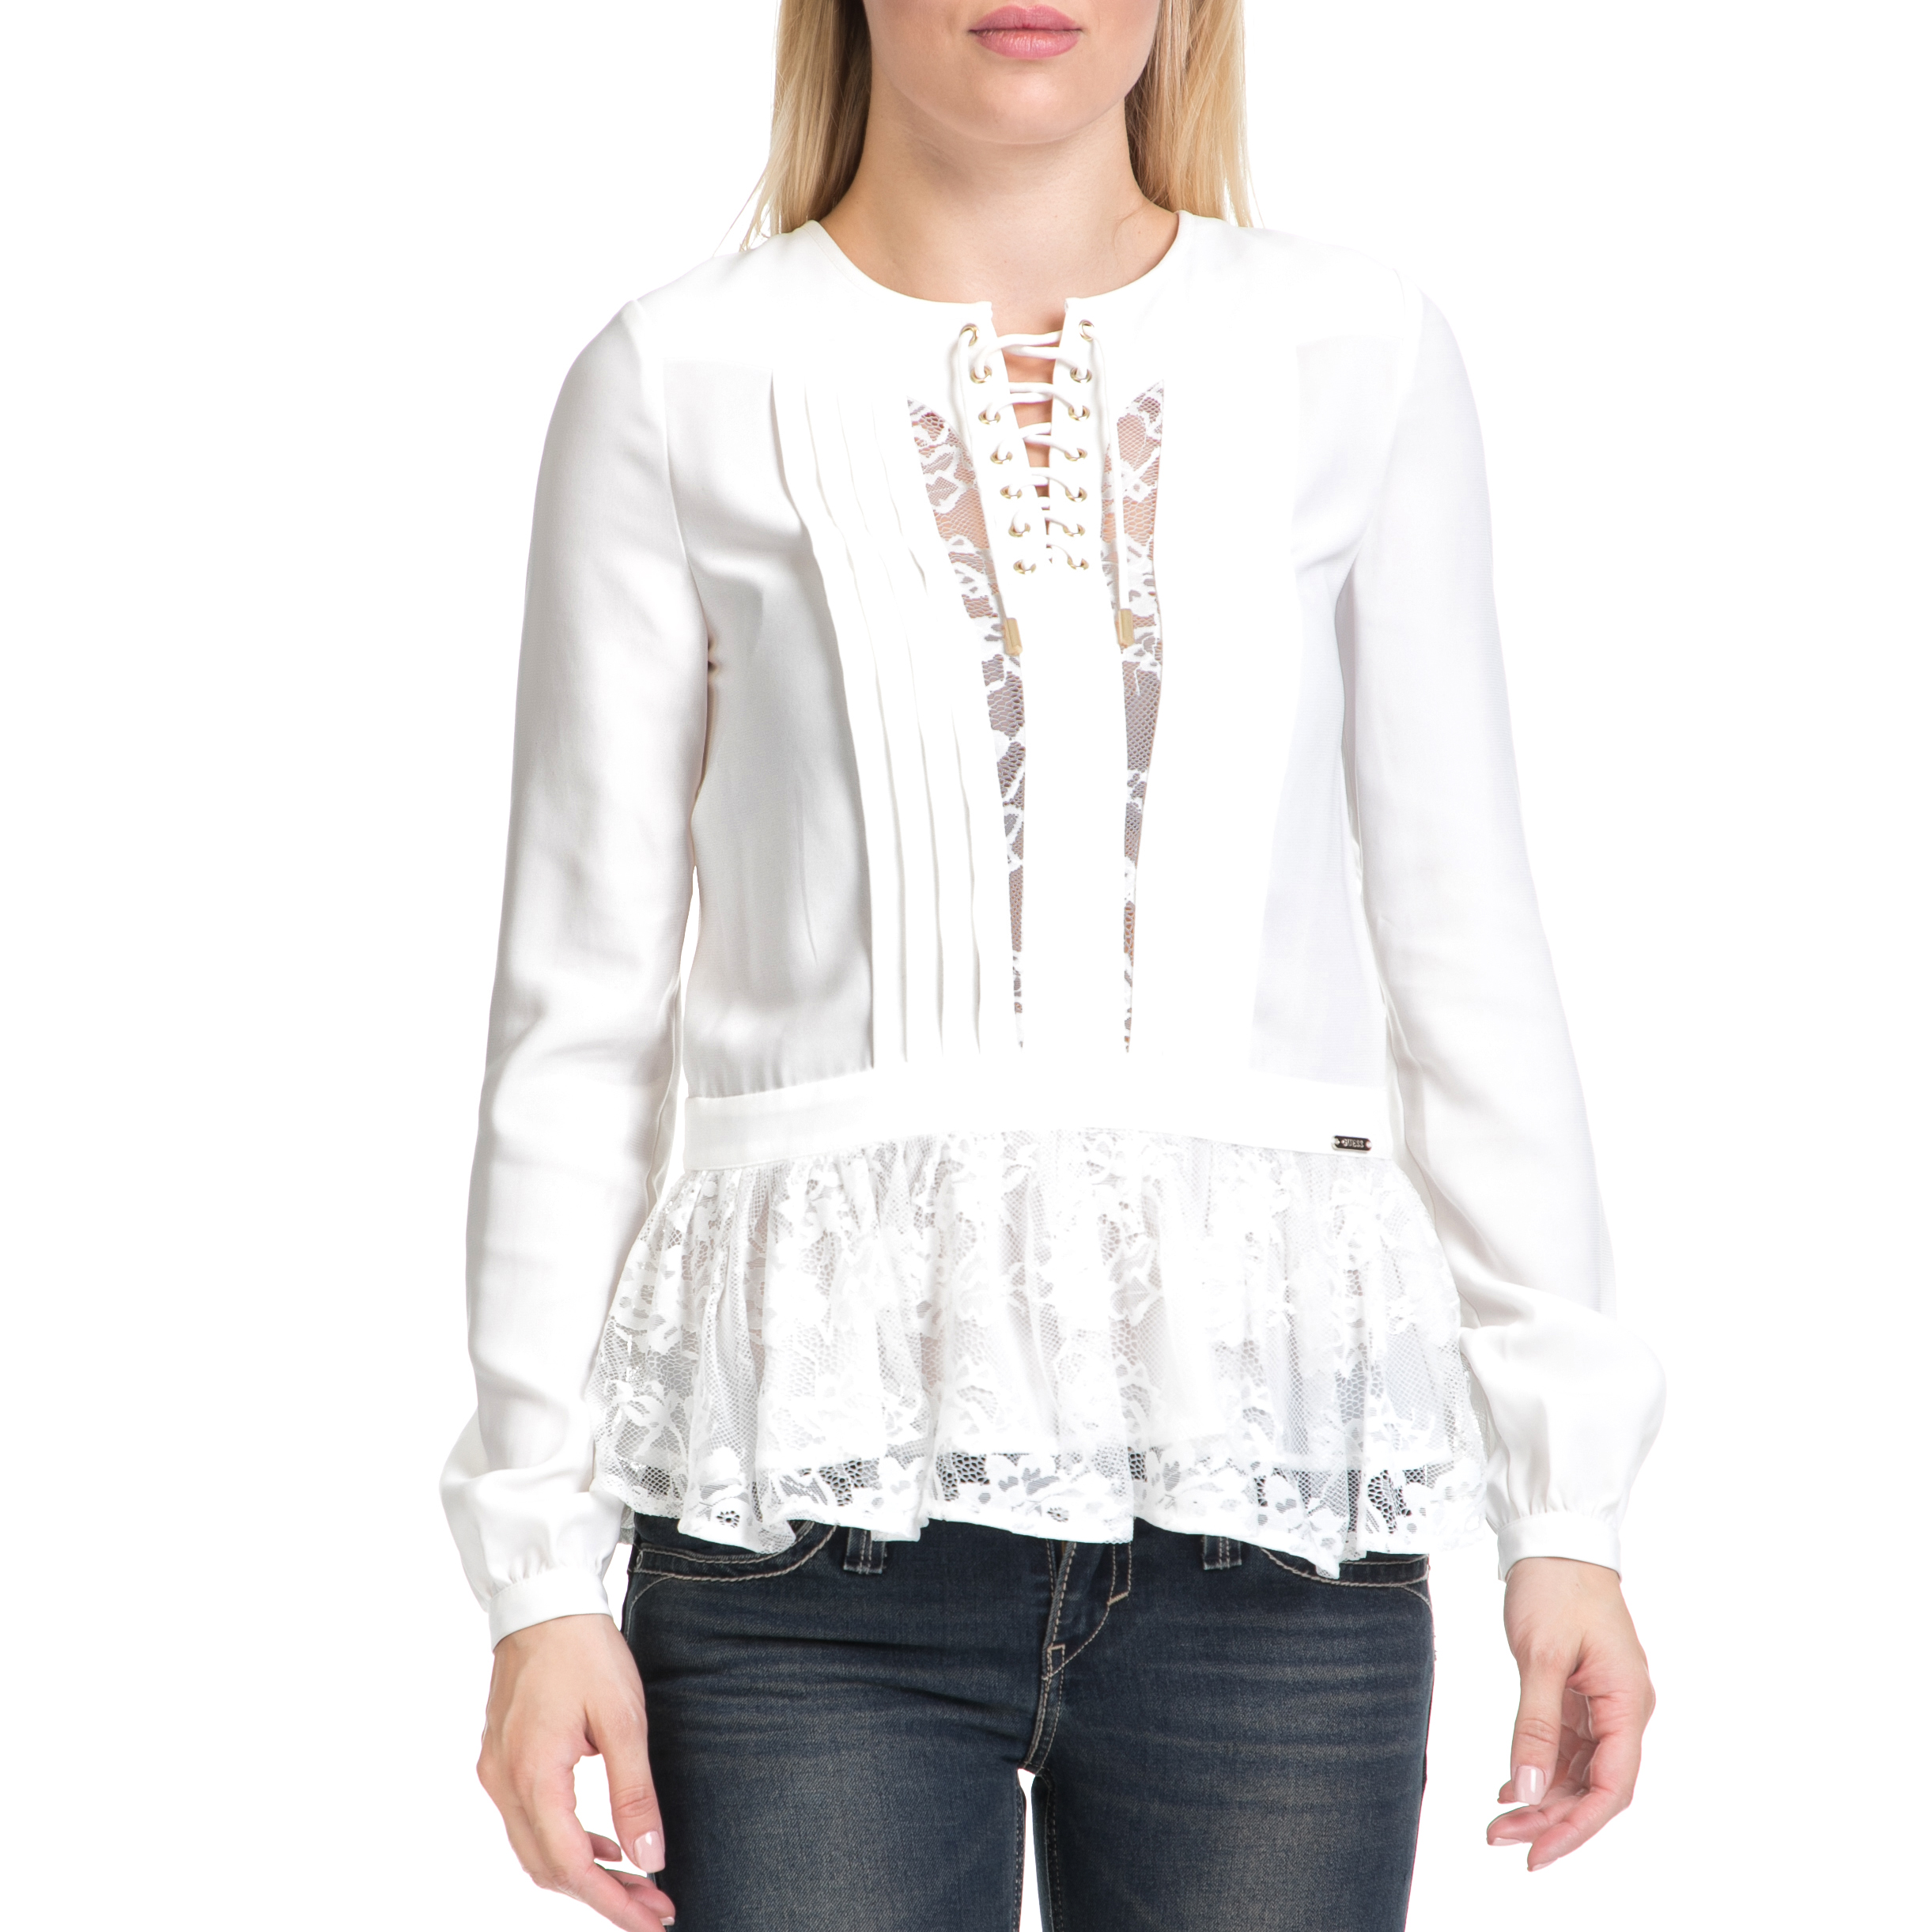 GUESS – Γυναικεία μπλούζα ANNALISA GUESS λευκή